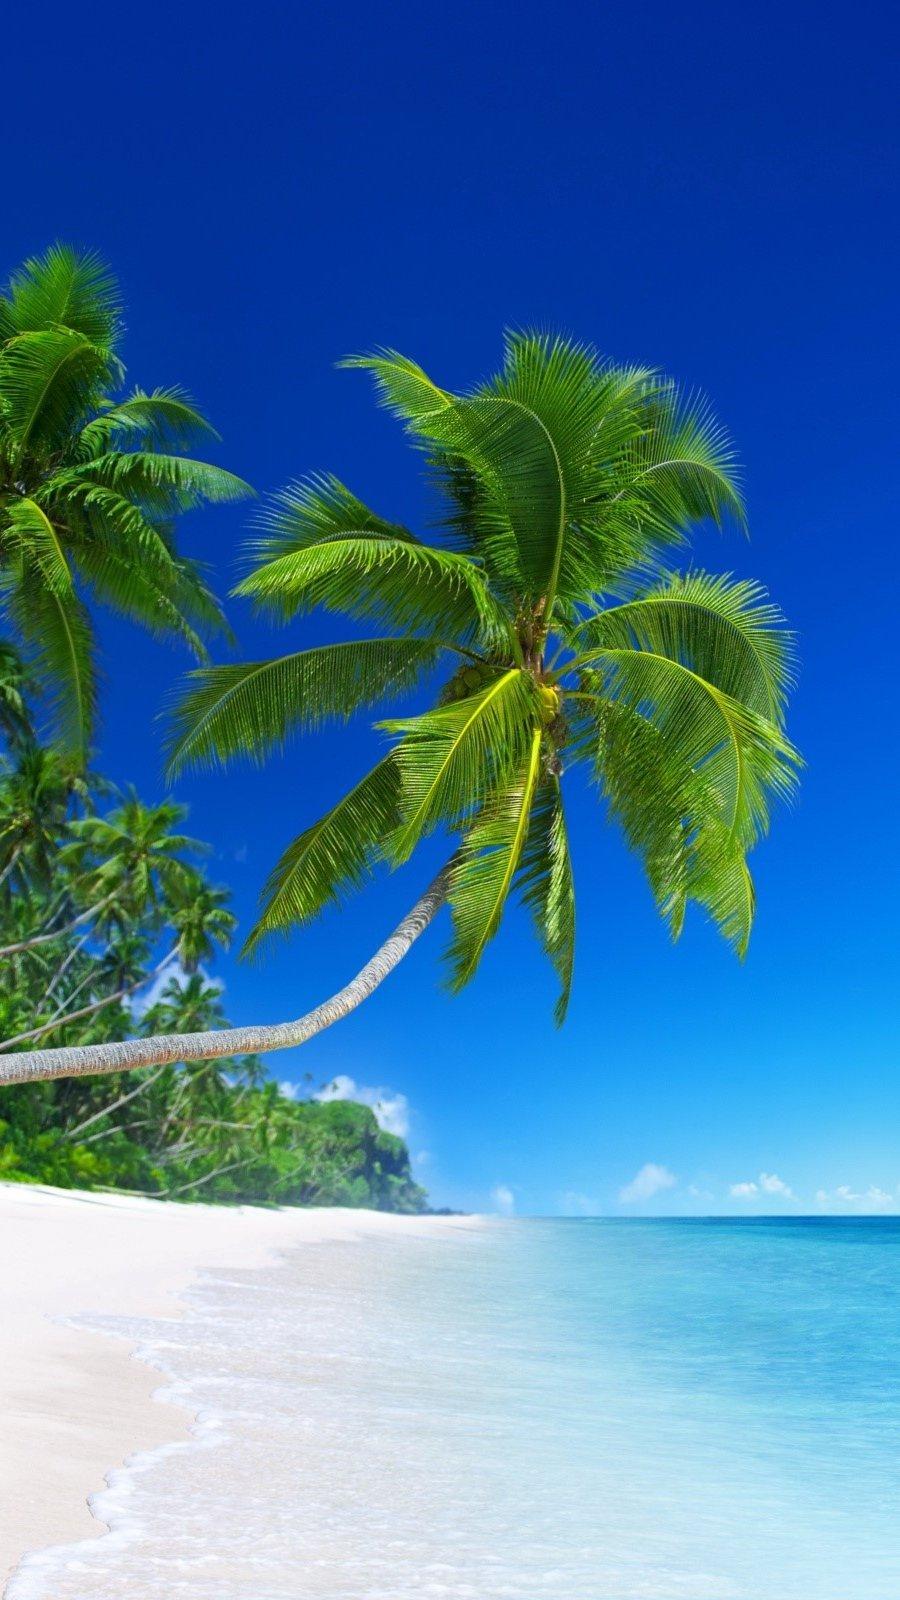 Fondos de pantalla Playa tropical Vertical